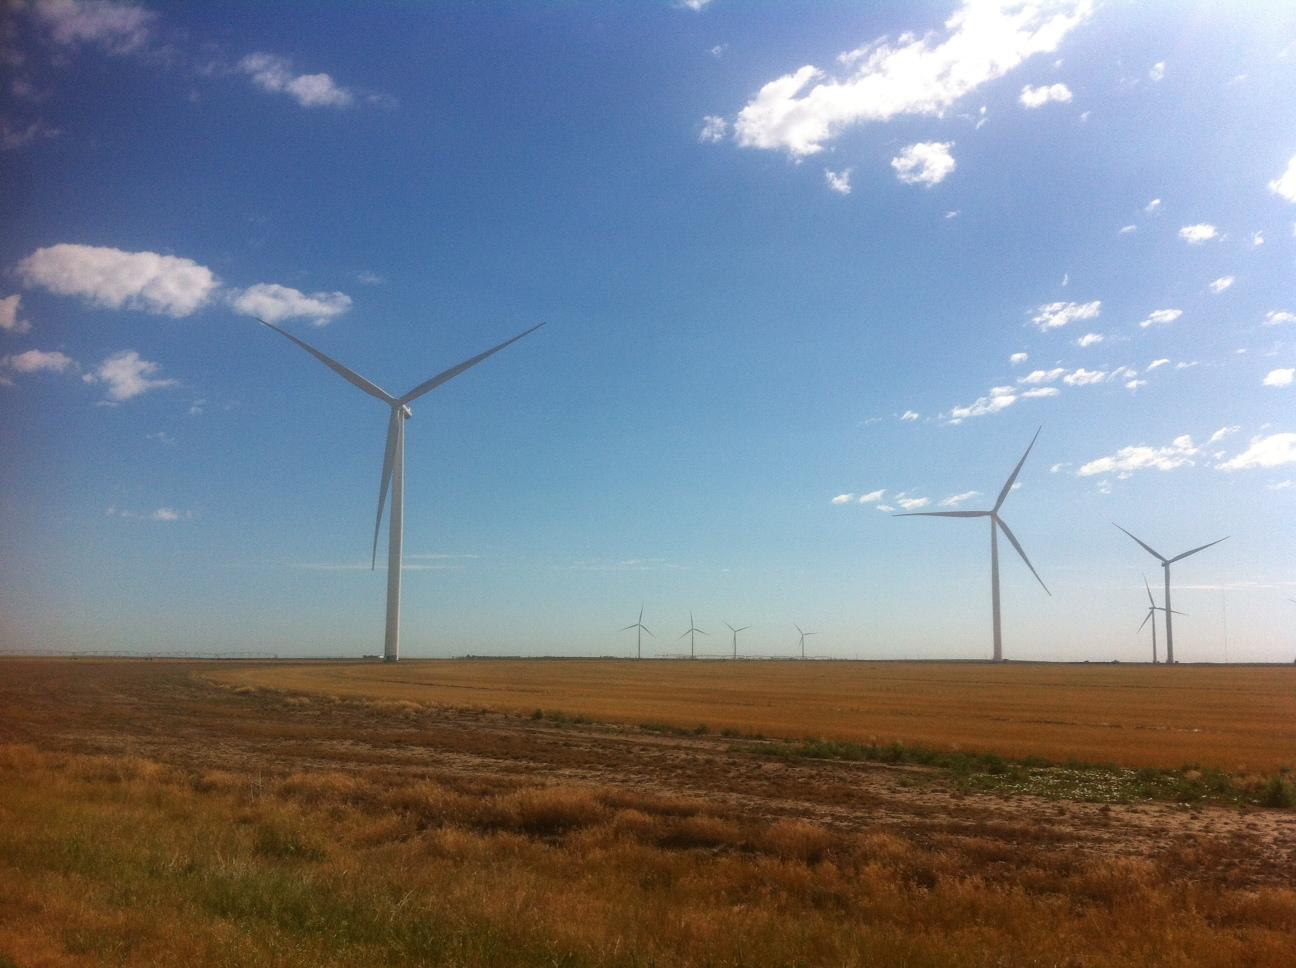 One of many wind turbine farms. This is near Cimarron, KS.